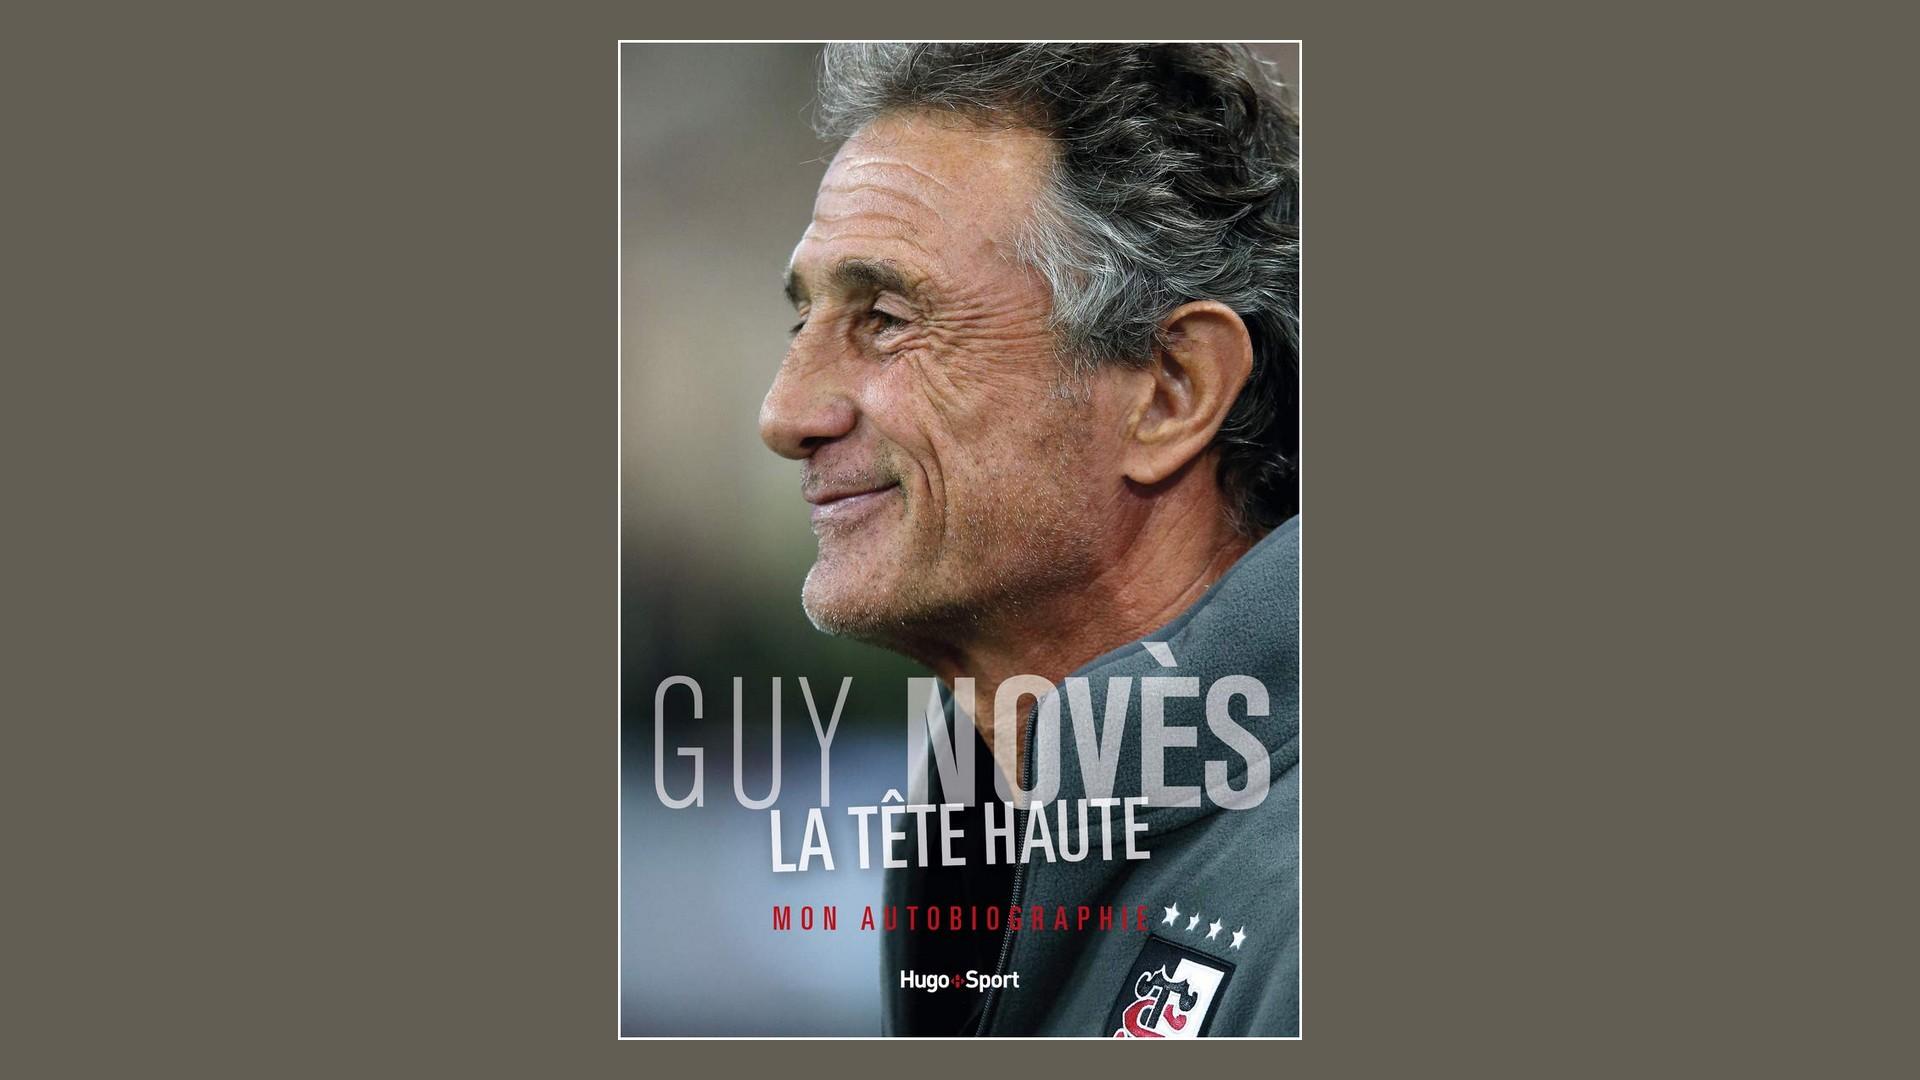 Livres – La tête haute – Guy Noves (2021)